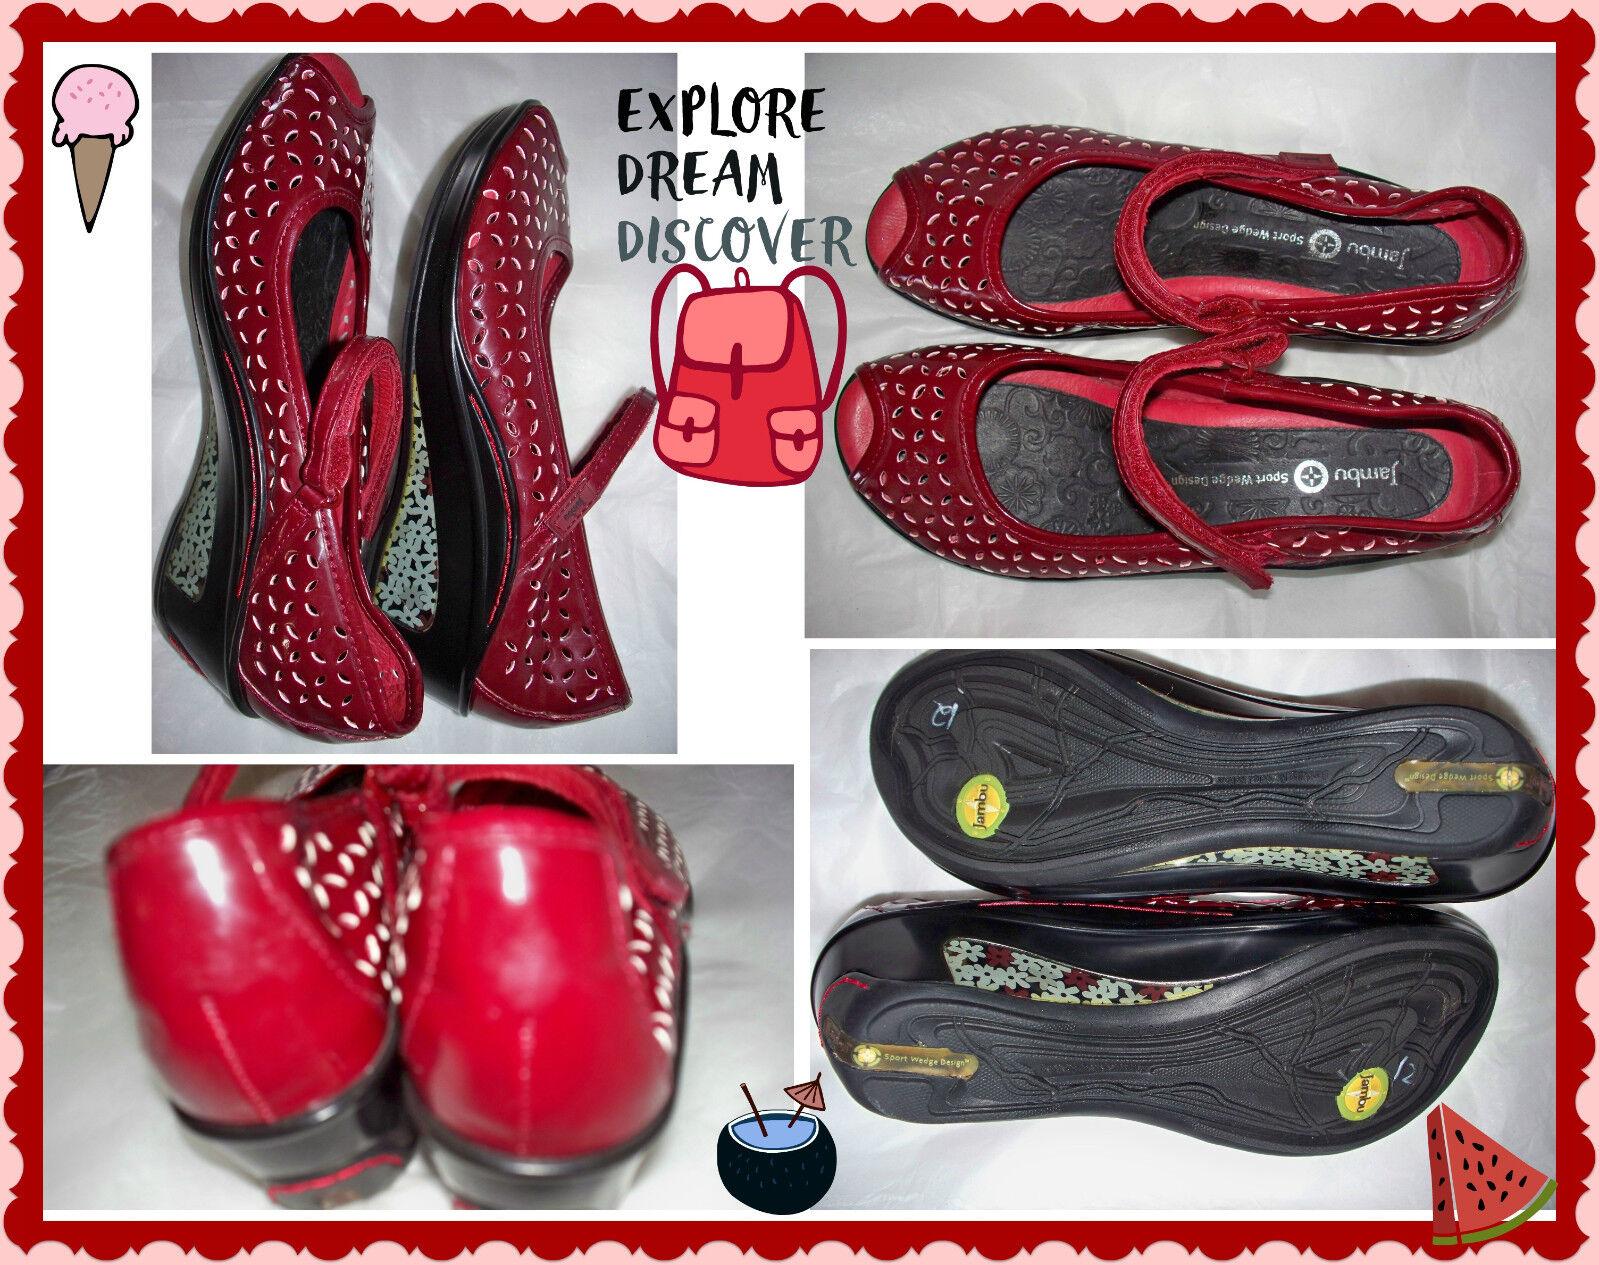 6.5 Jambu Plutón Plutón Plutón Estilo Mary Jane Peep Toe Zapatos De Tacón Patente Granate Vino Tinto cuñas  nuevo listado